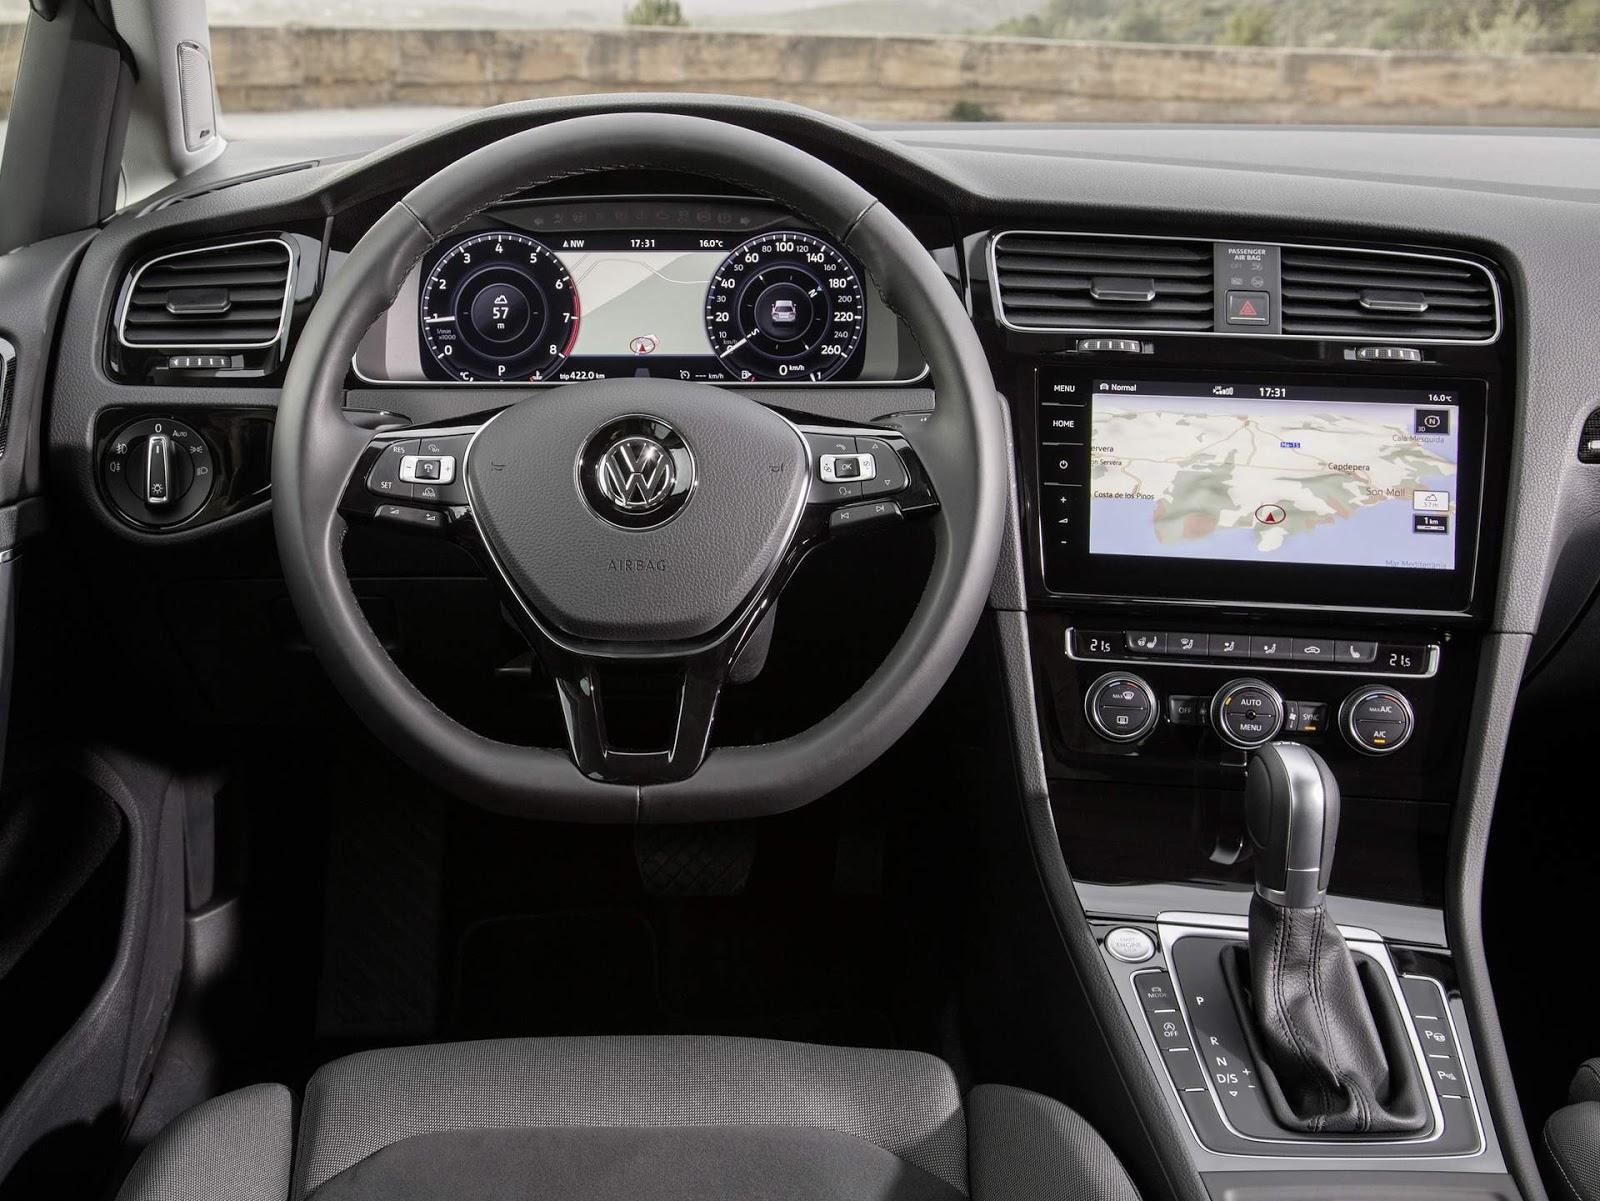 Novo VW Golf 2018 1.5 TSI Evo: preços e consumo - Europa ...